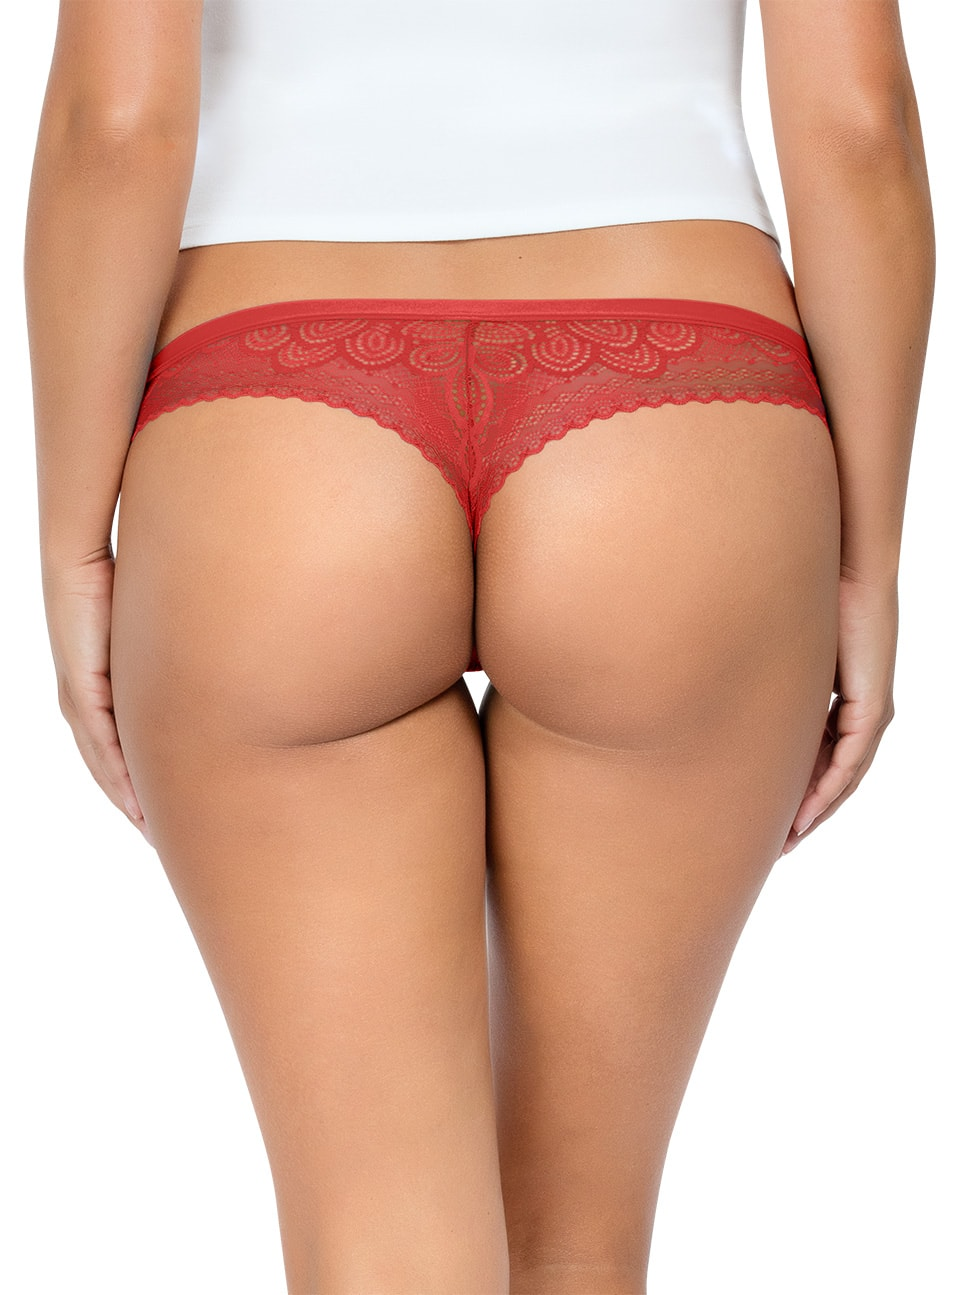 PARFAIT ParfaitPanty SoGlam ThongPP402 Scarlette Back close - Panty So Glam Thong - Scarlette - PP402